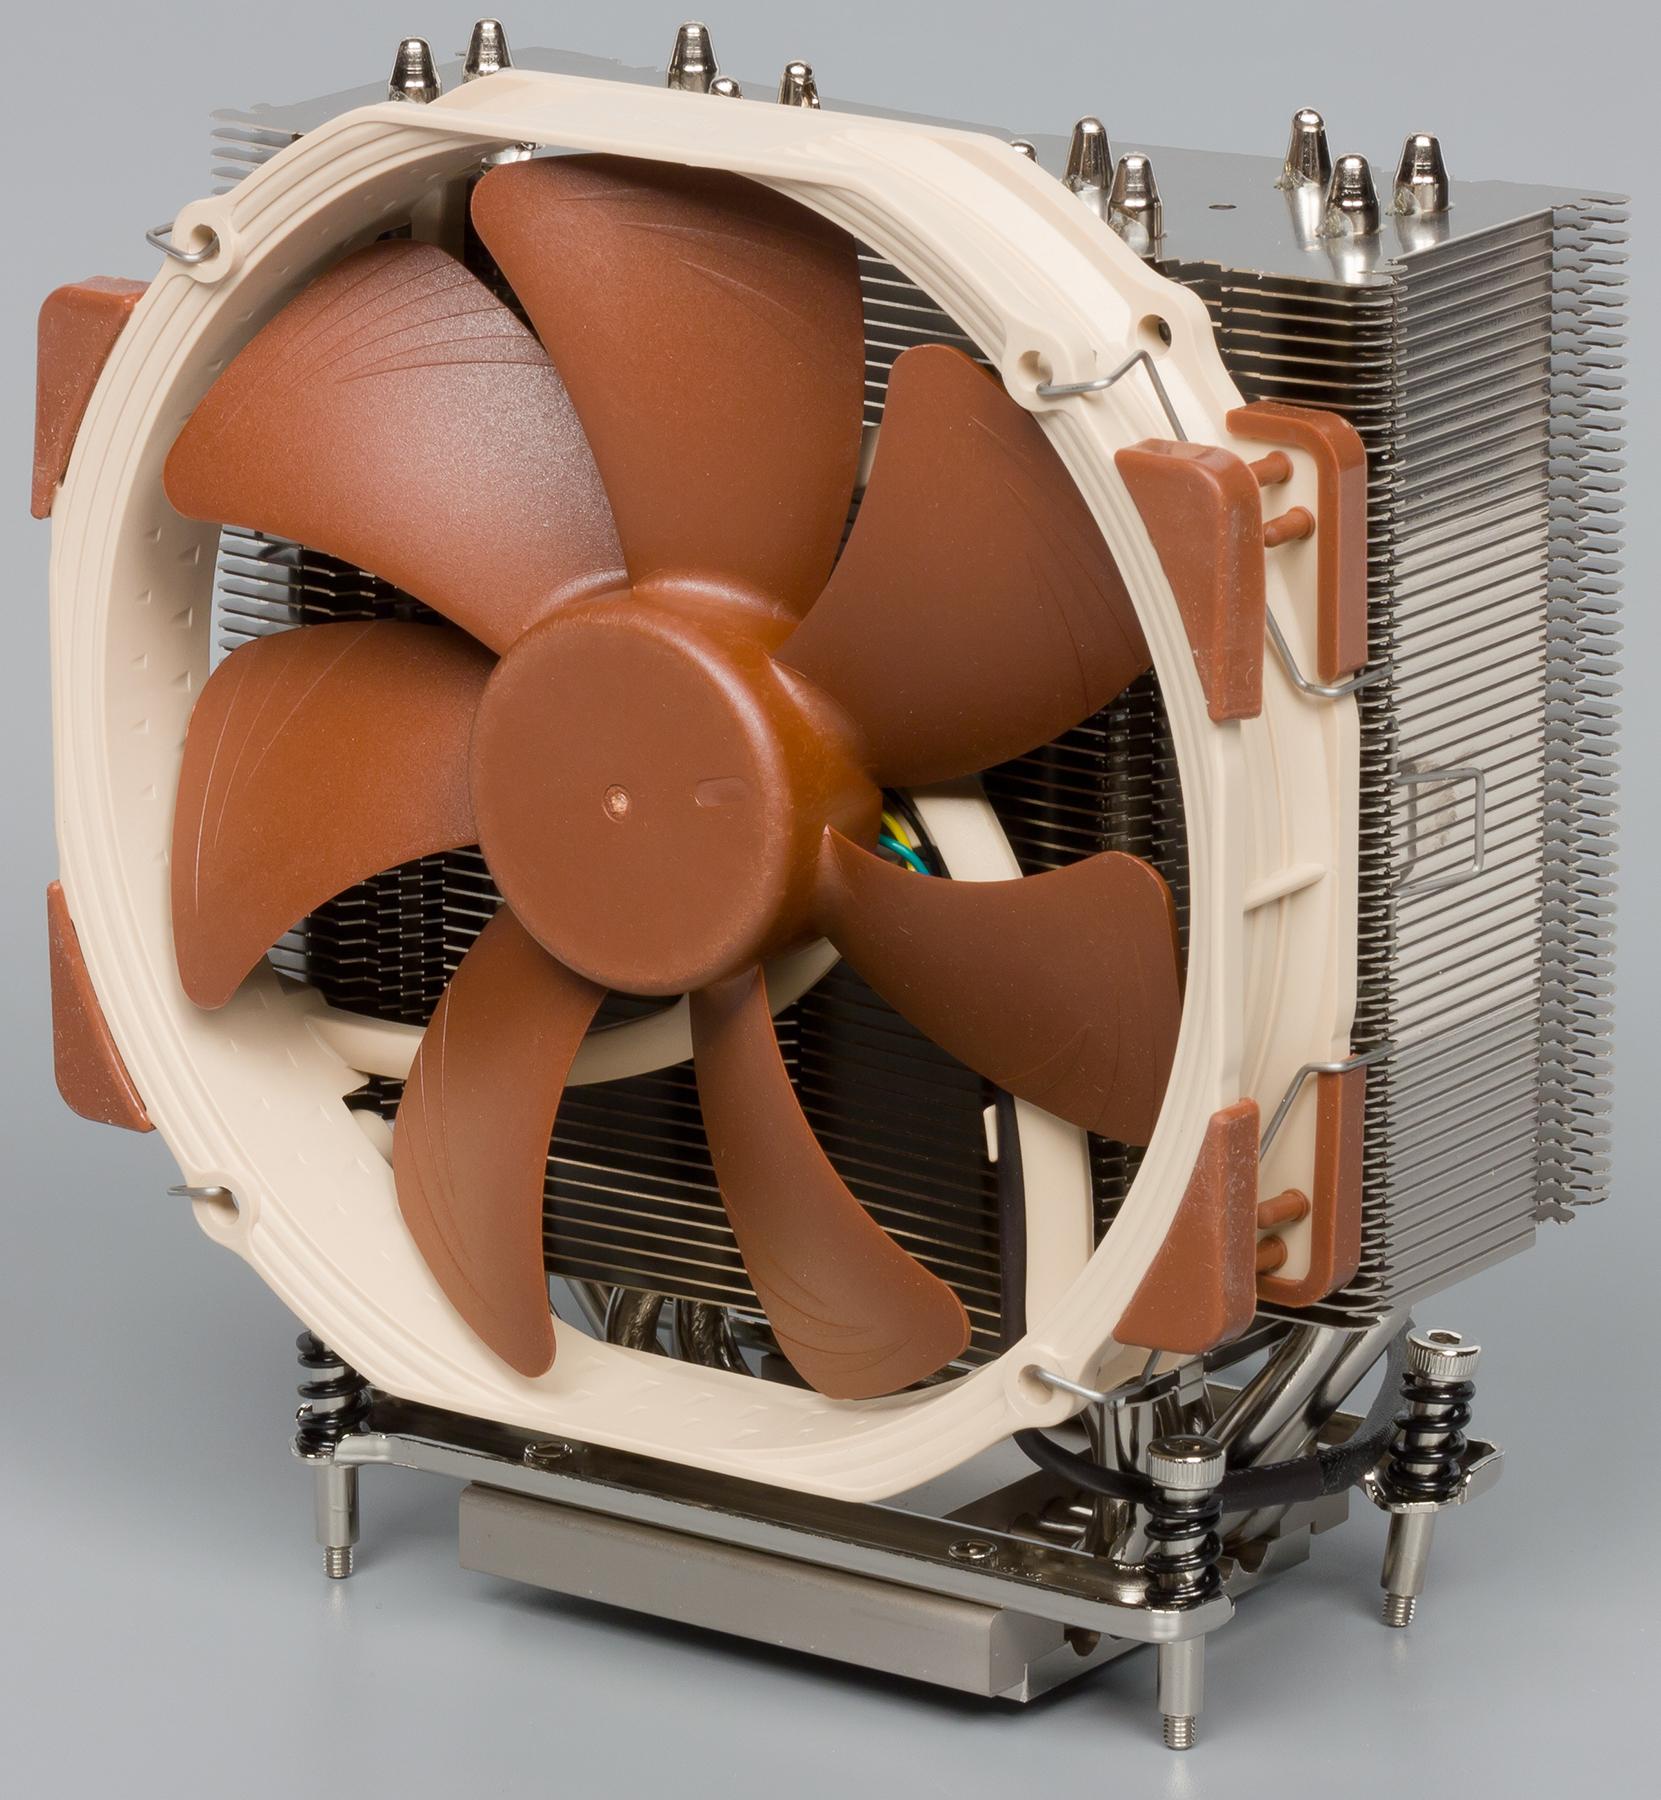 Обзор и тест процессорного кулера Noctua NH-C14S — i2HARD